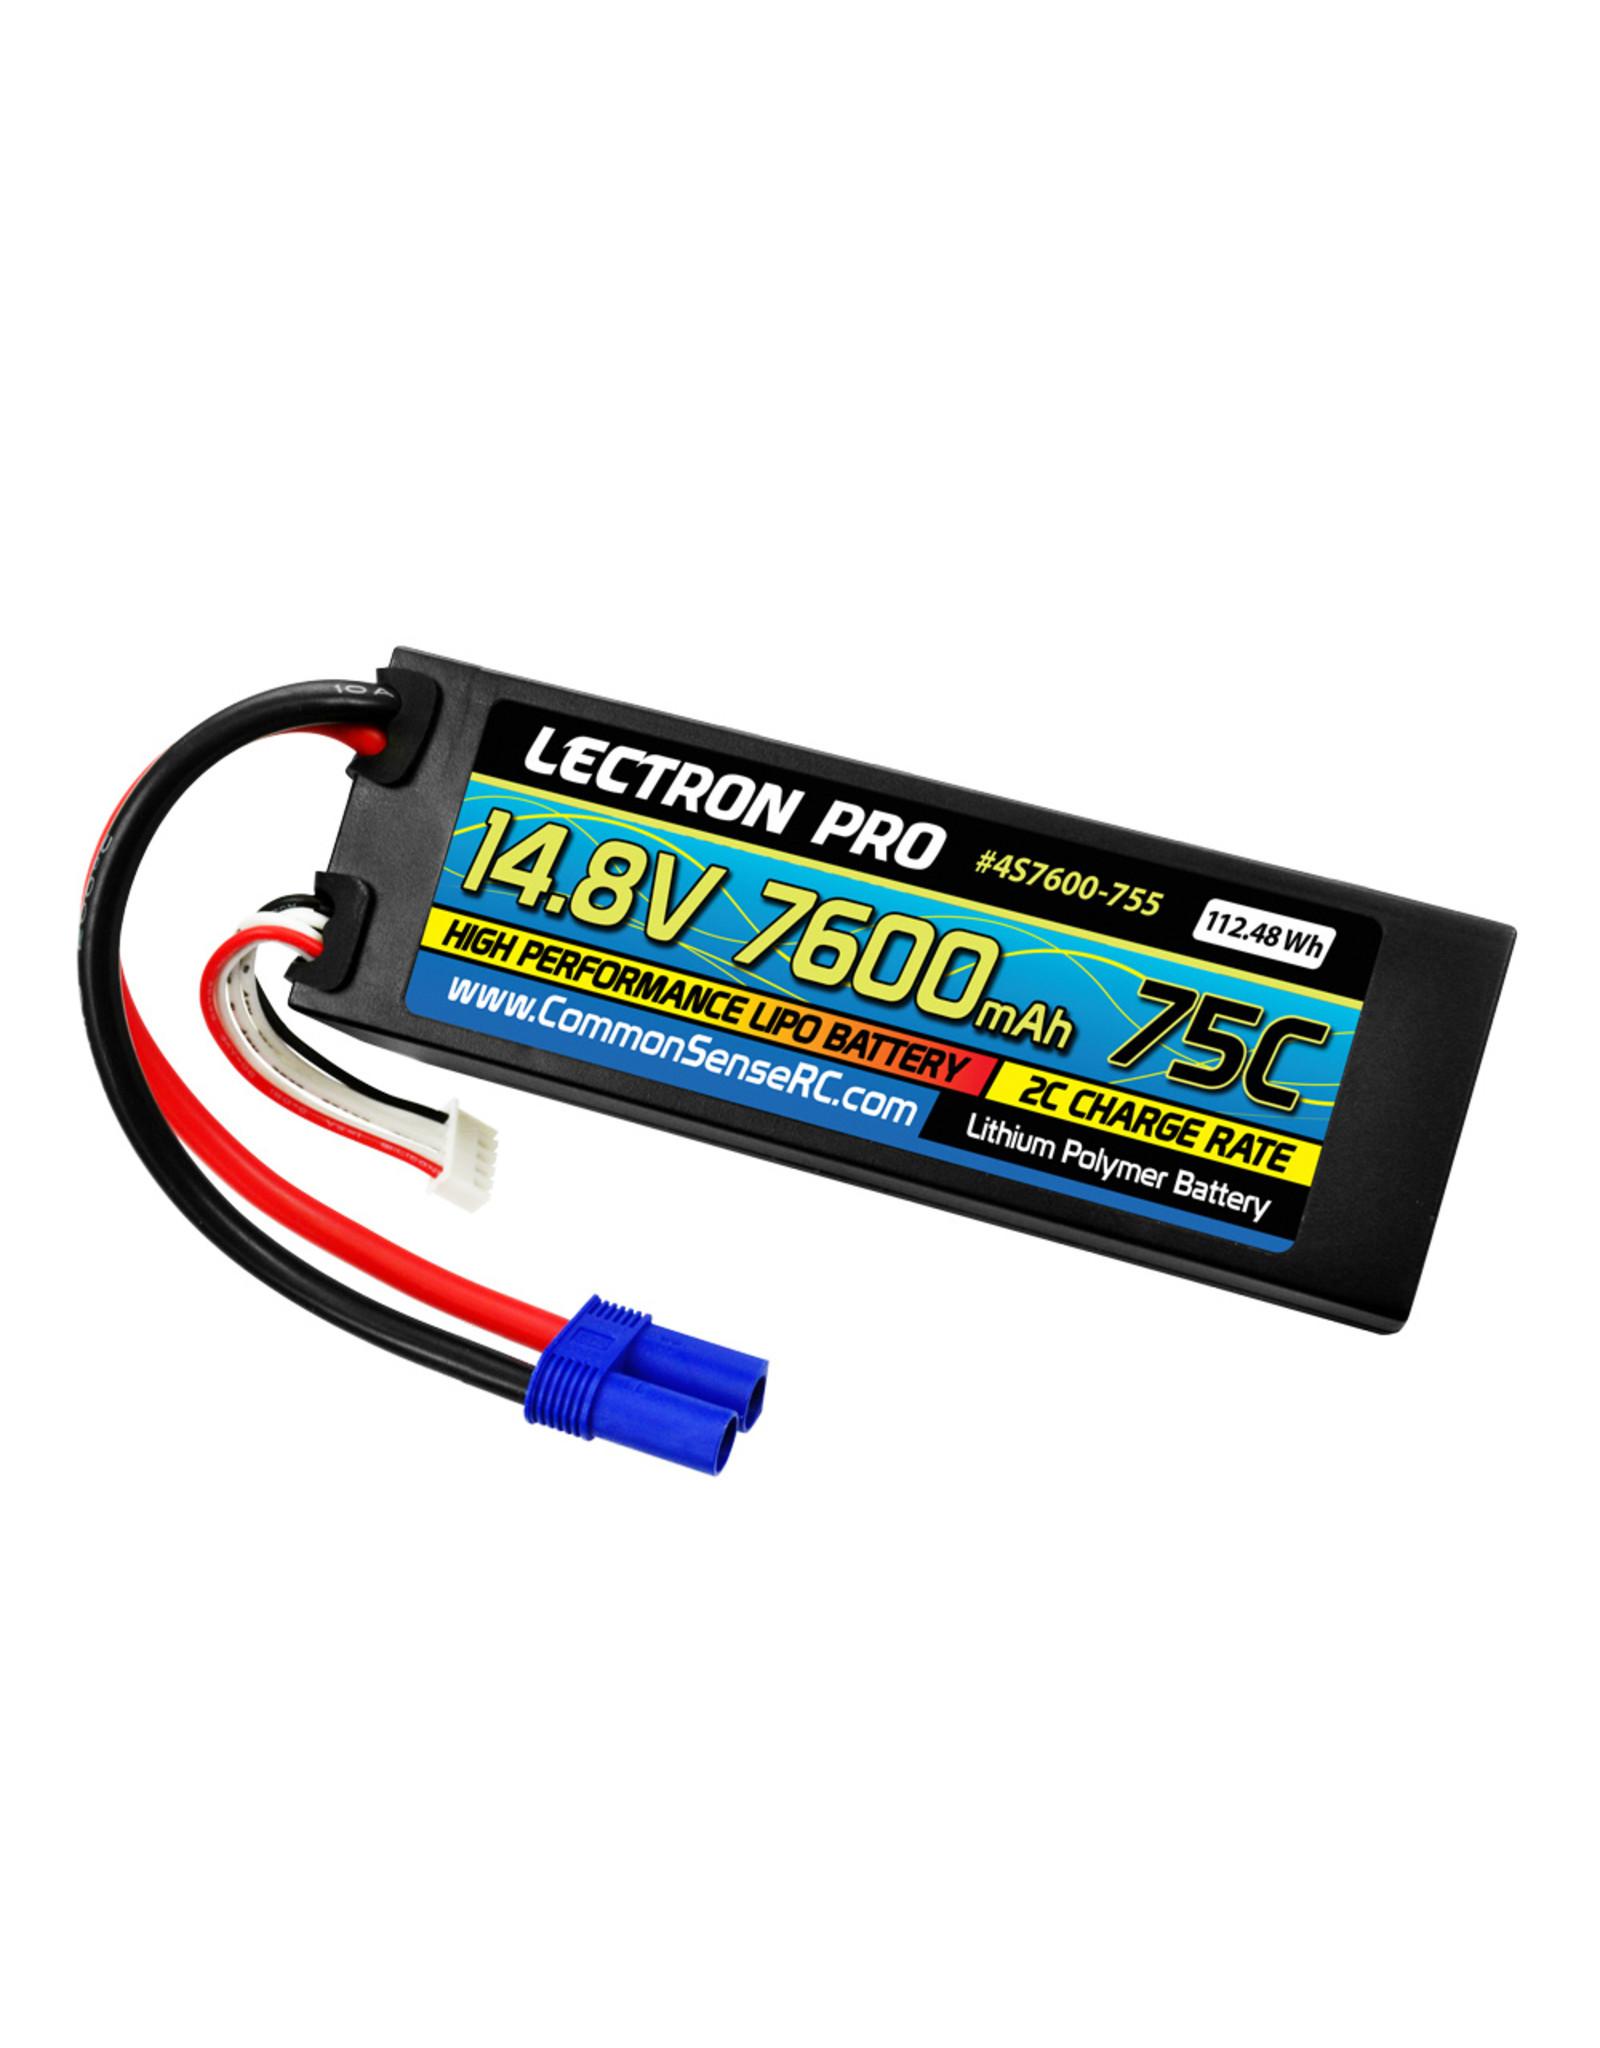 Common Sense RC 4S7600-755 - 14.8V 7600mAh 75C Hard Case Lipo Battery with EC5 Connector